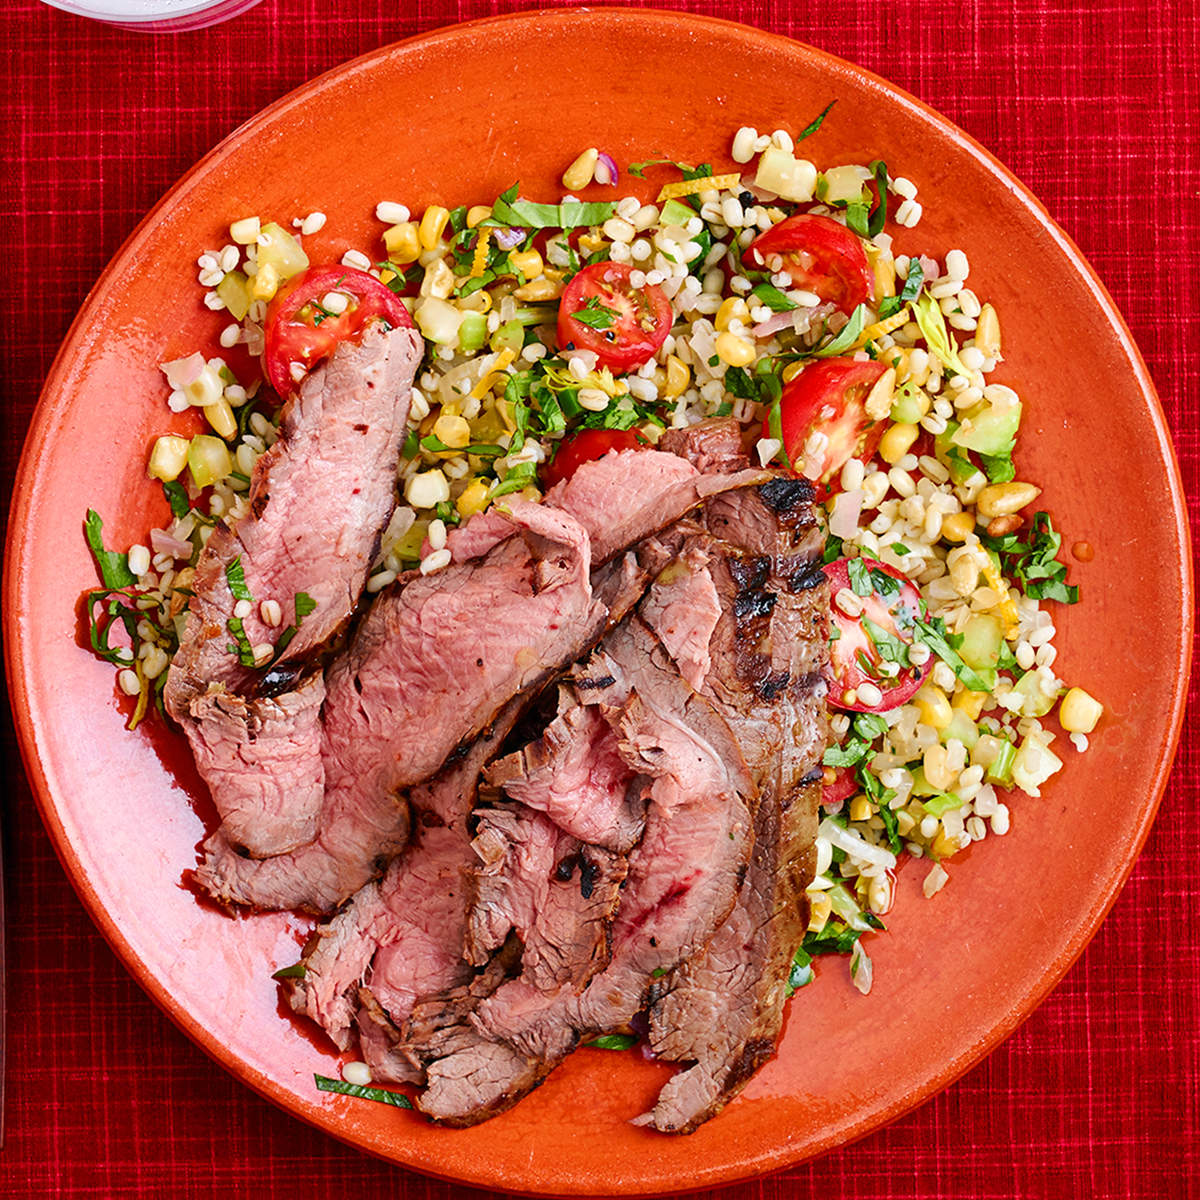 Pearled Barley & Corn Salad